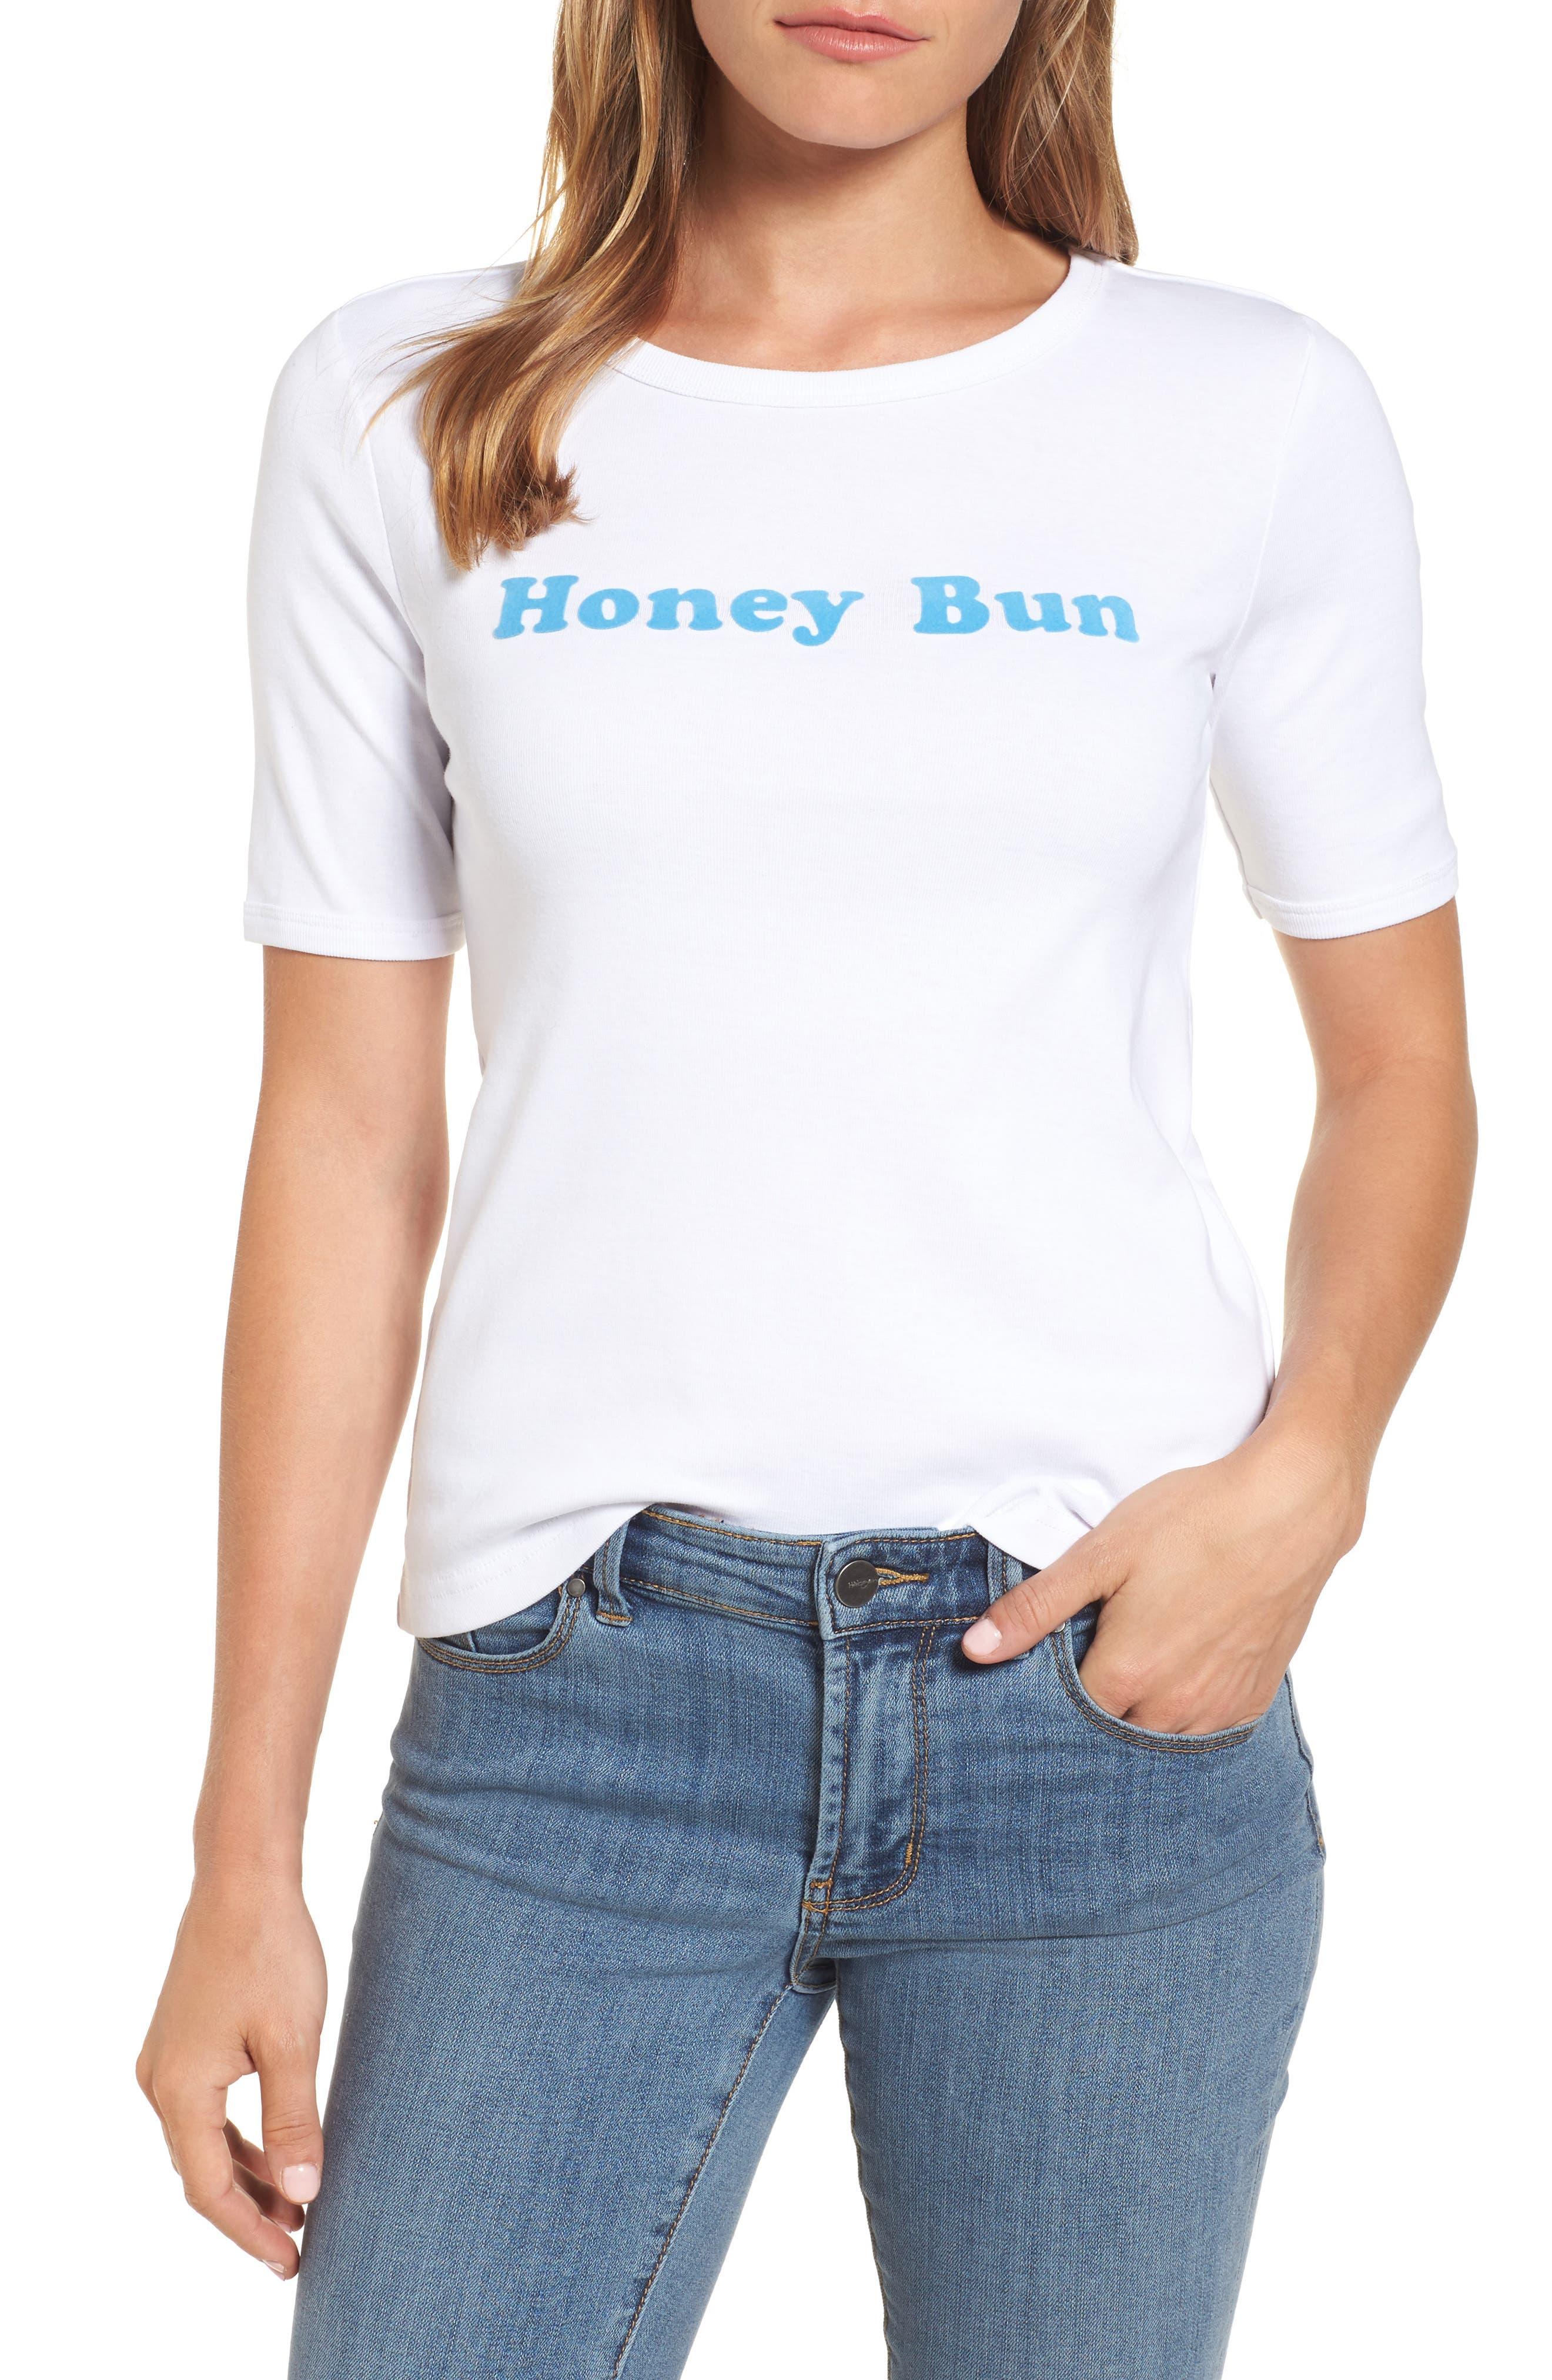 Honey Bun Tee,                         Main,                         color, Willow White